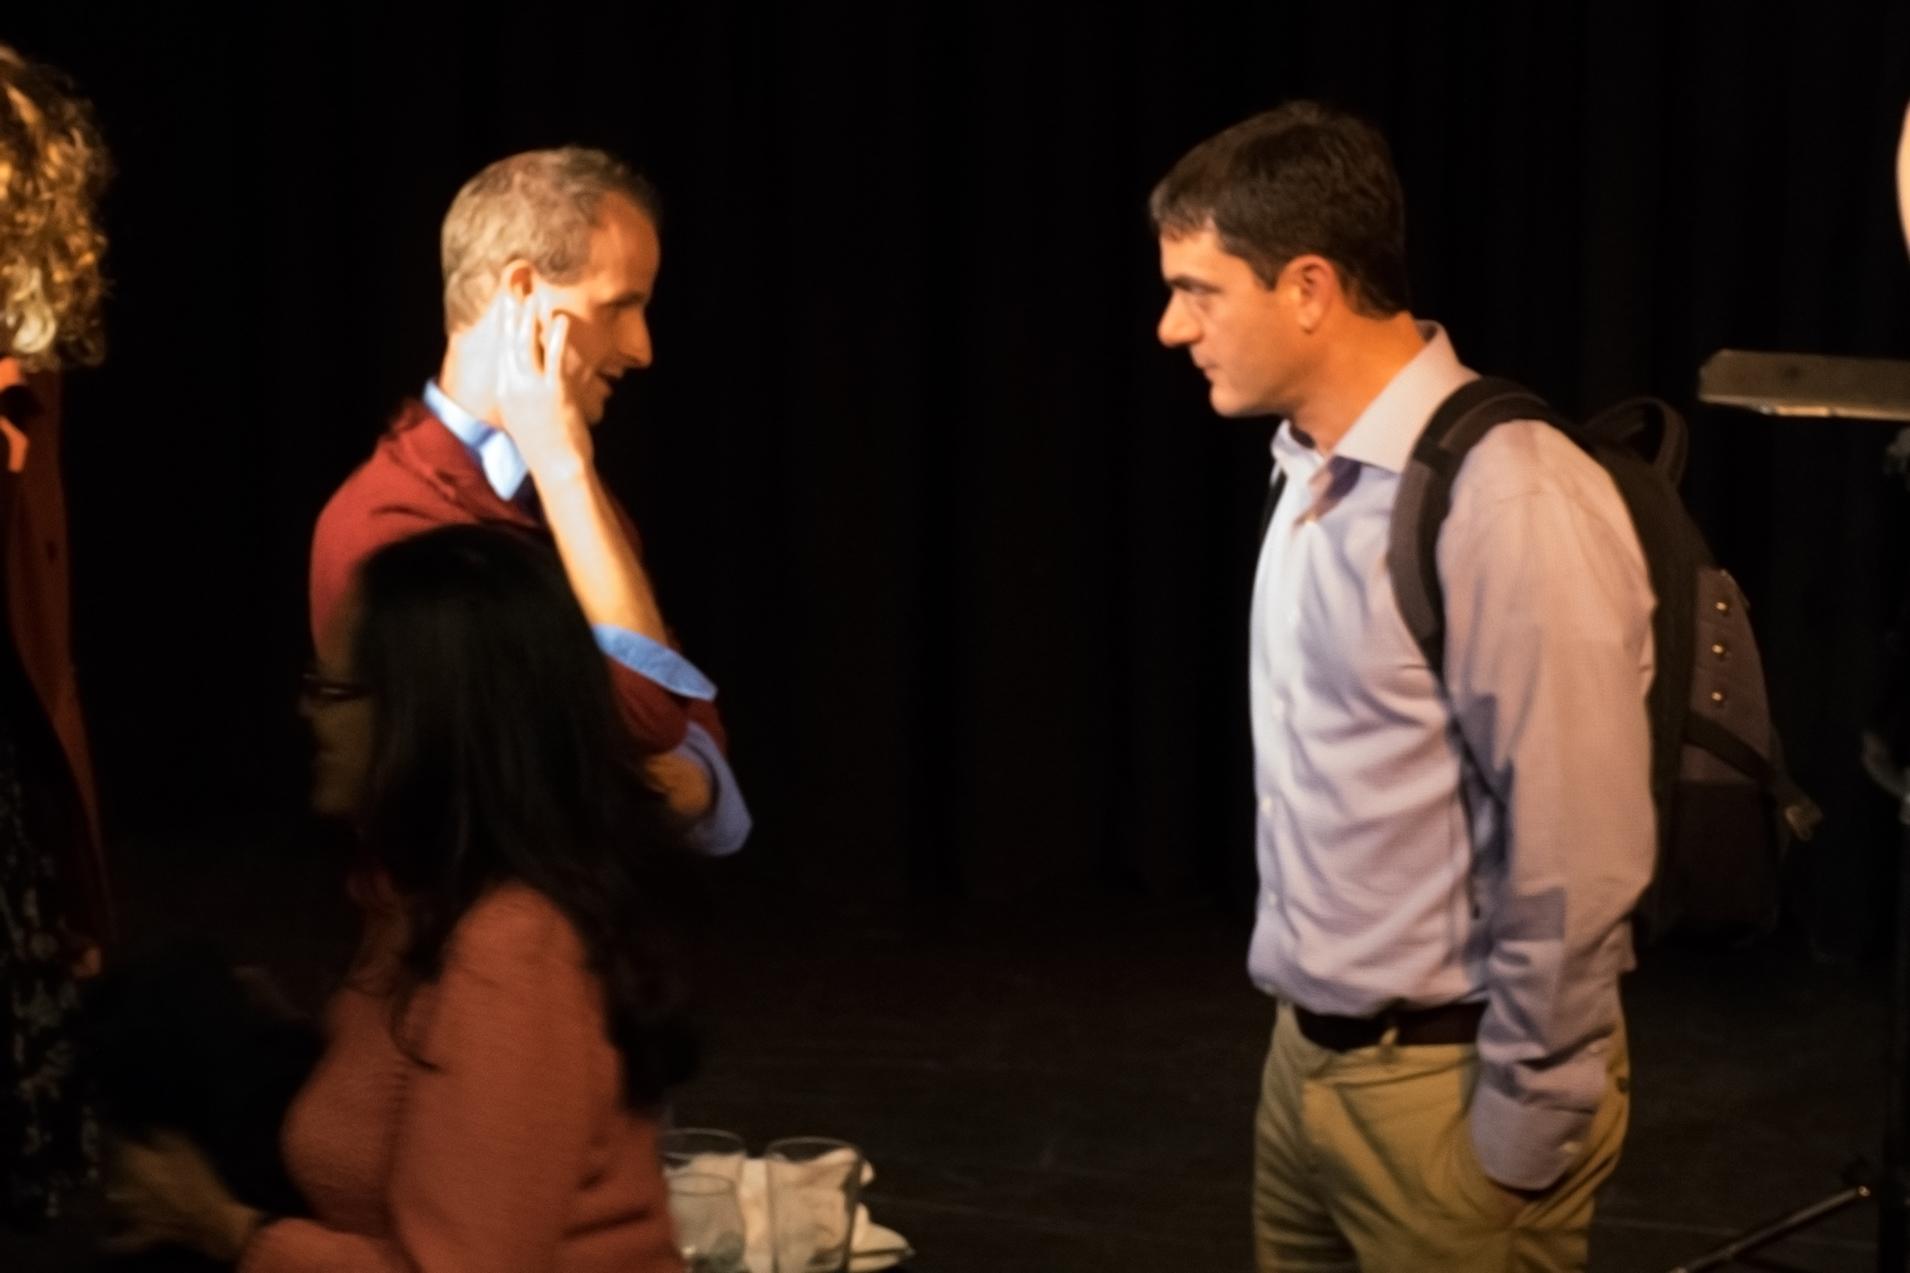 Dr. Adam Boyko speaks with an audience member